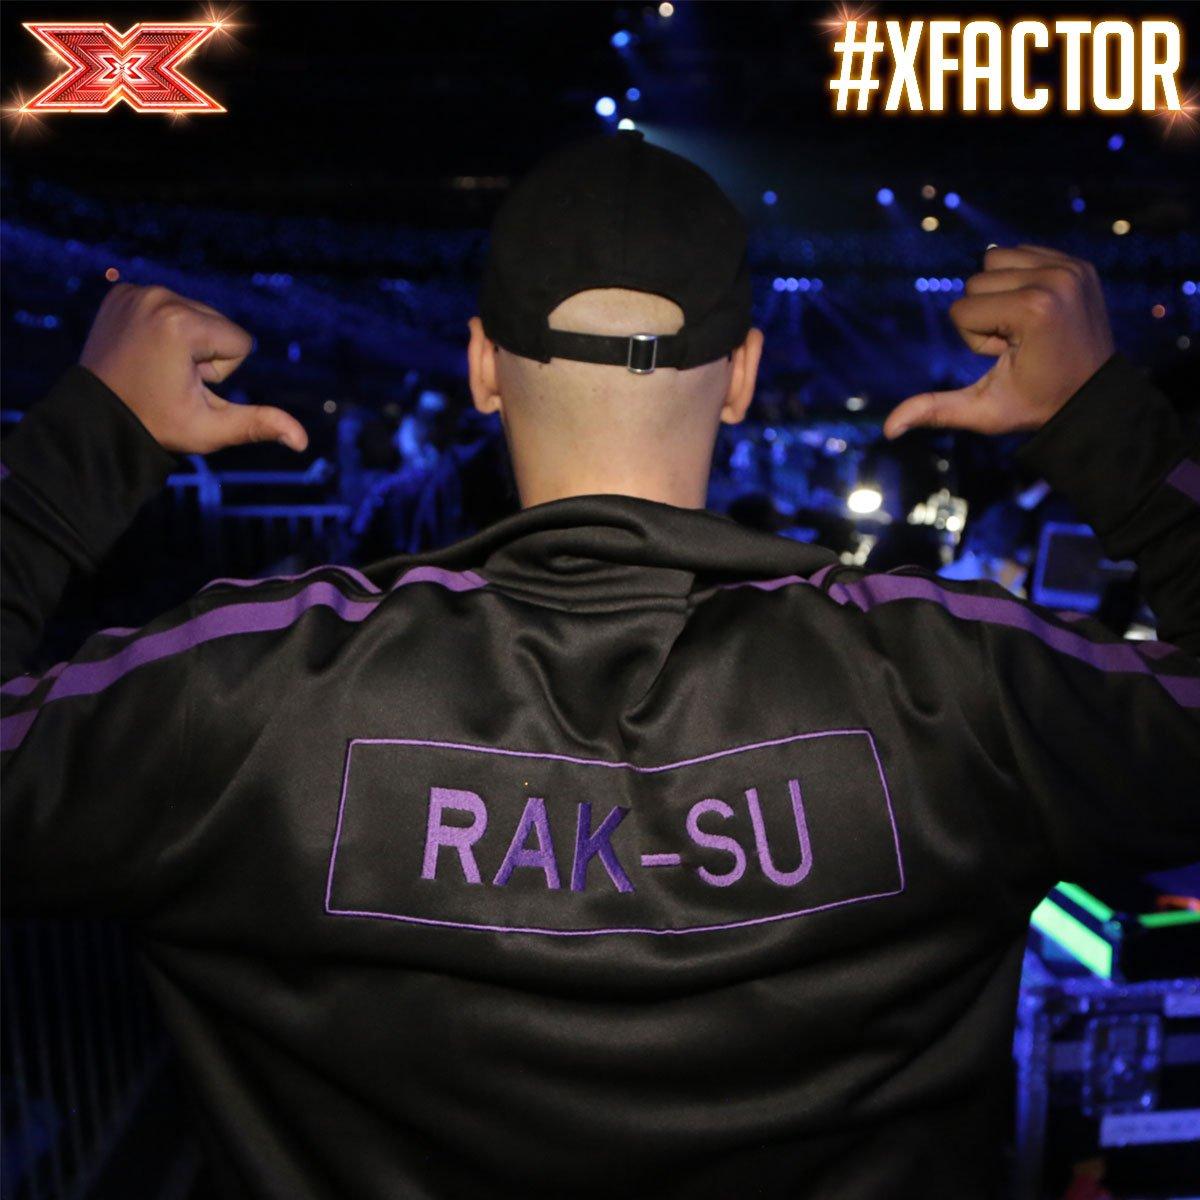 Rak-What!? @Mustafa_Raksu 🔥🔥🔥 #XFactor https://t.co/wO3gK6J5Dj